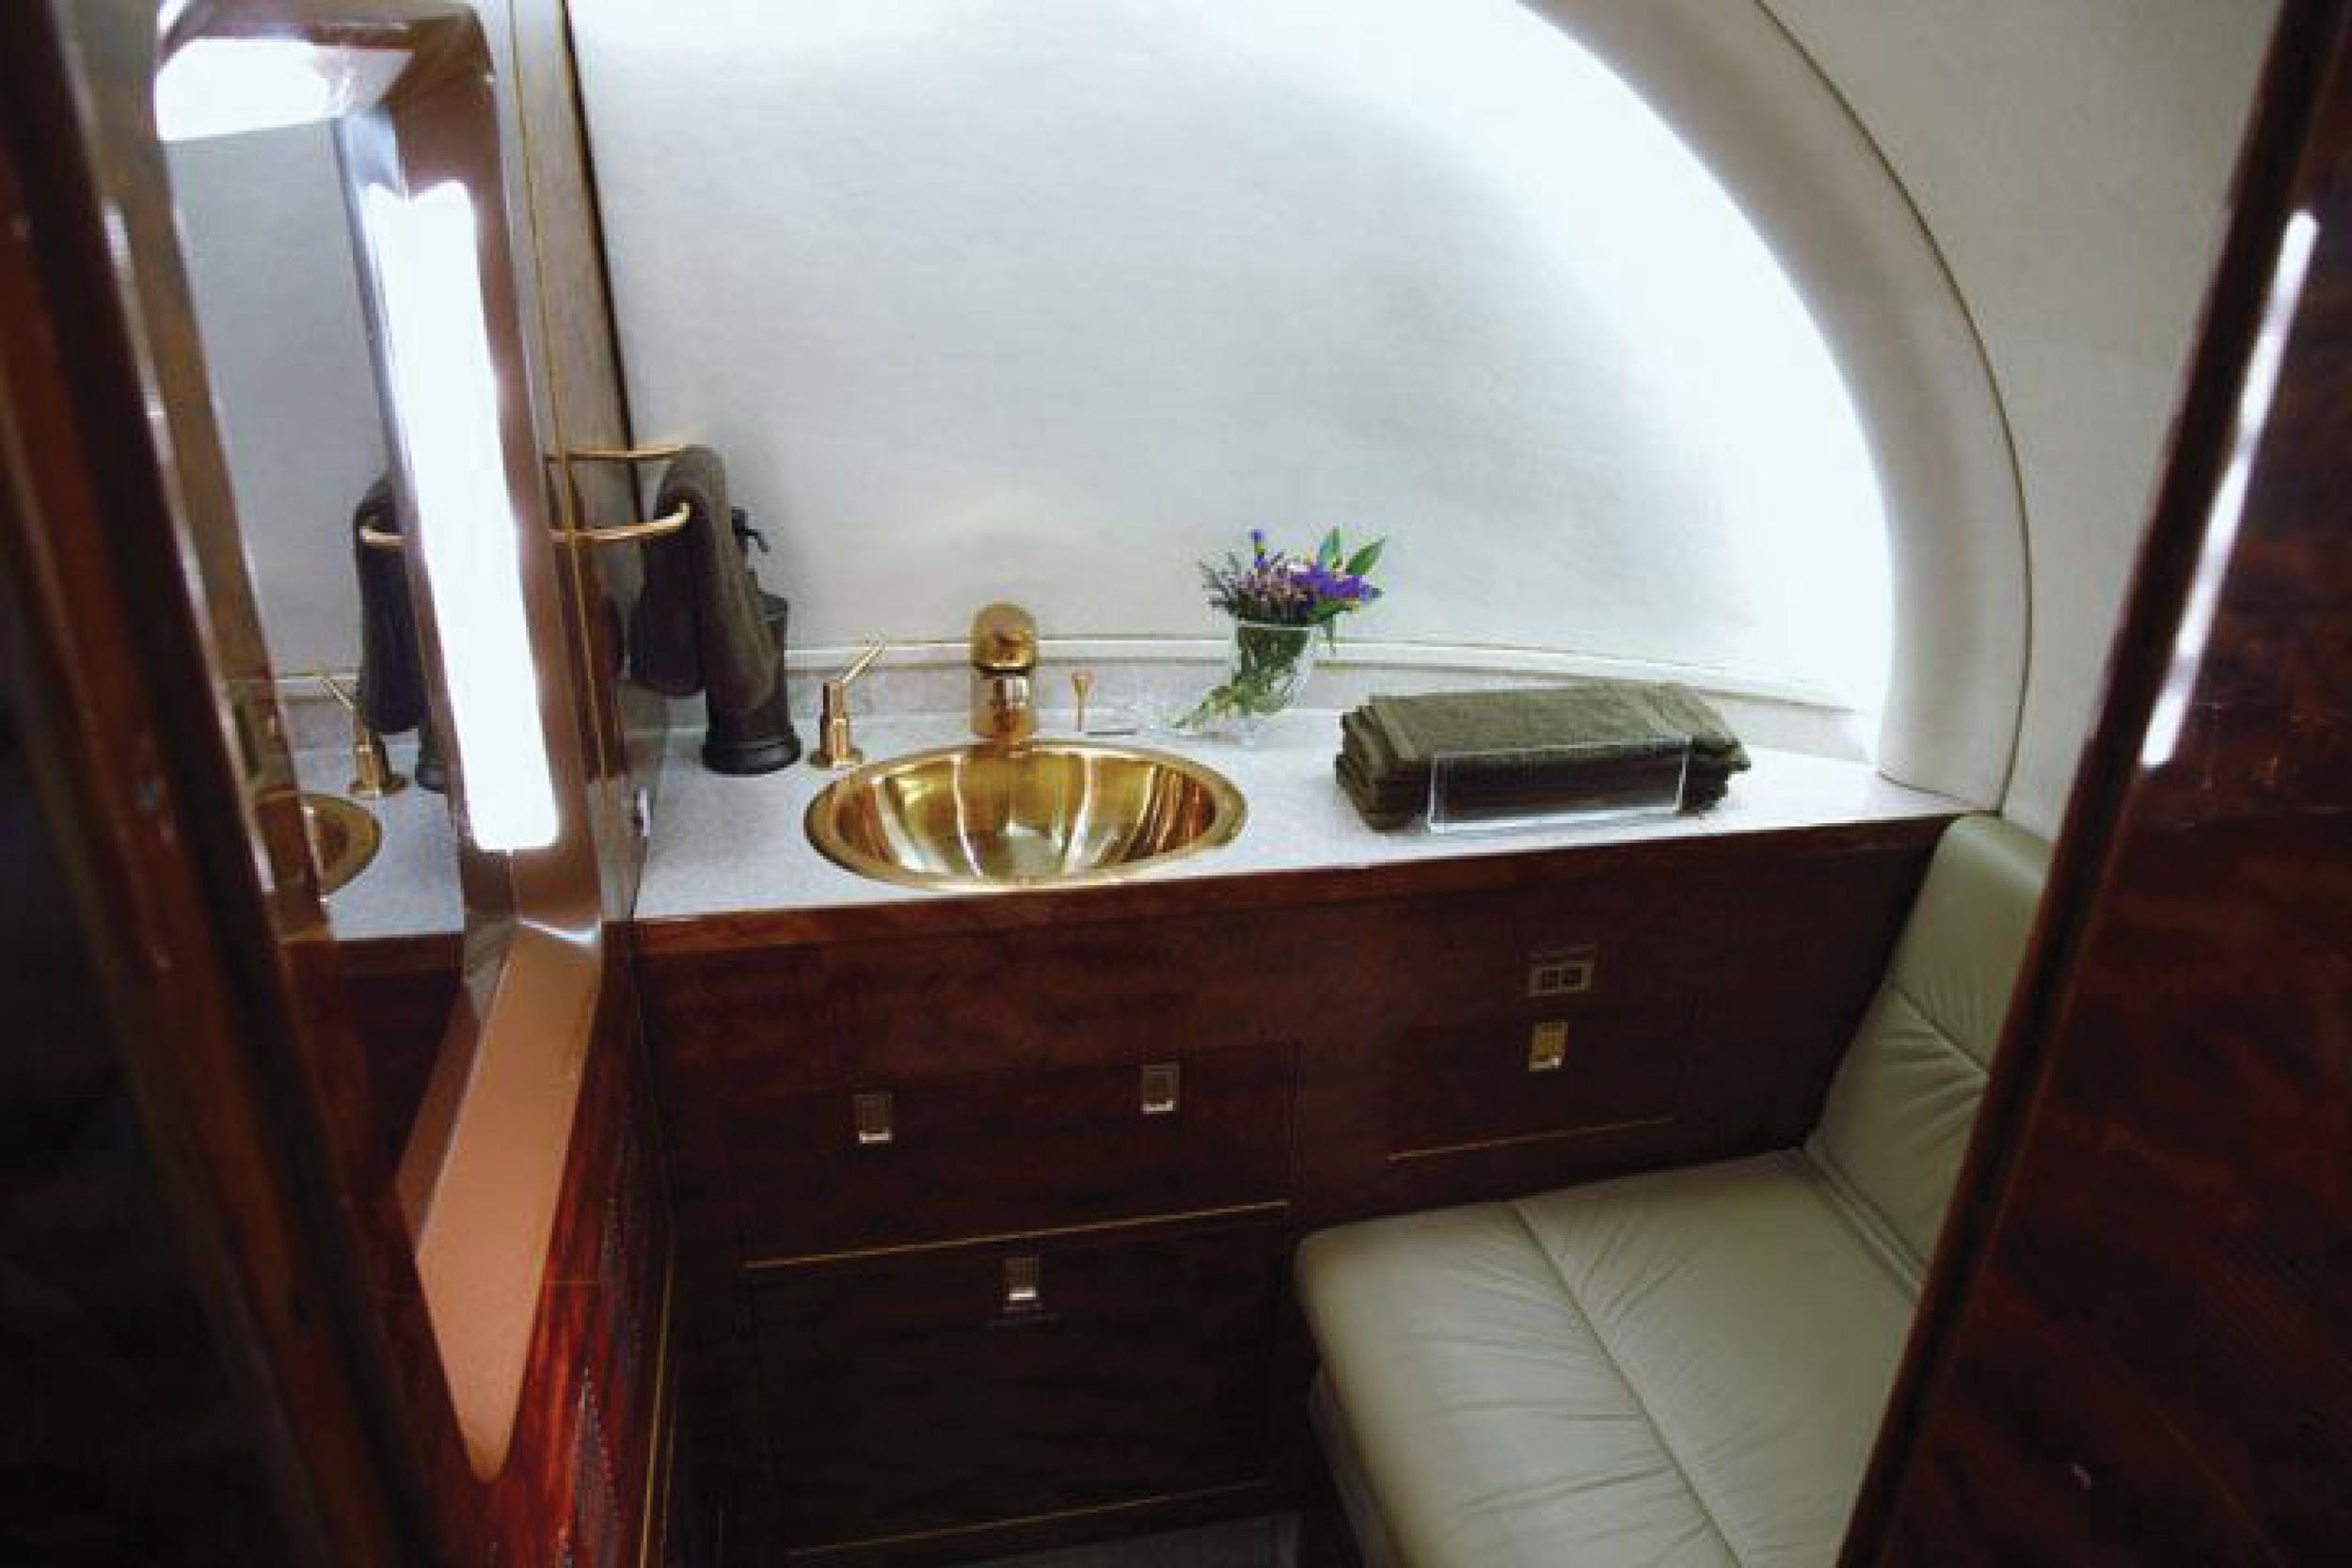 hawker_interior6.jpg